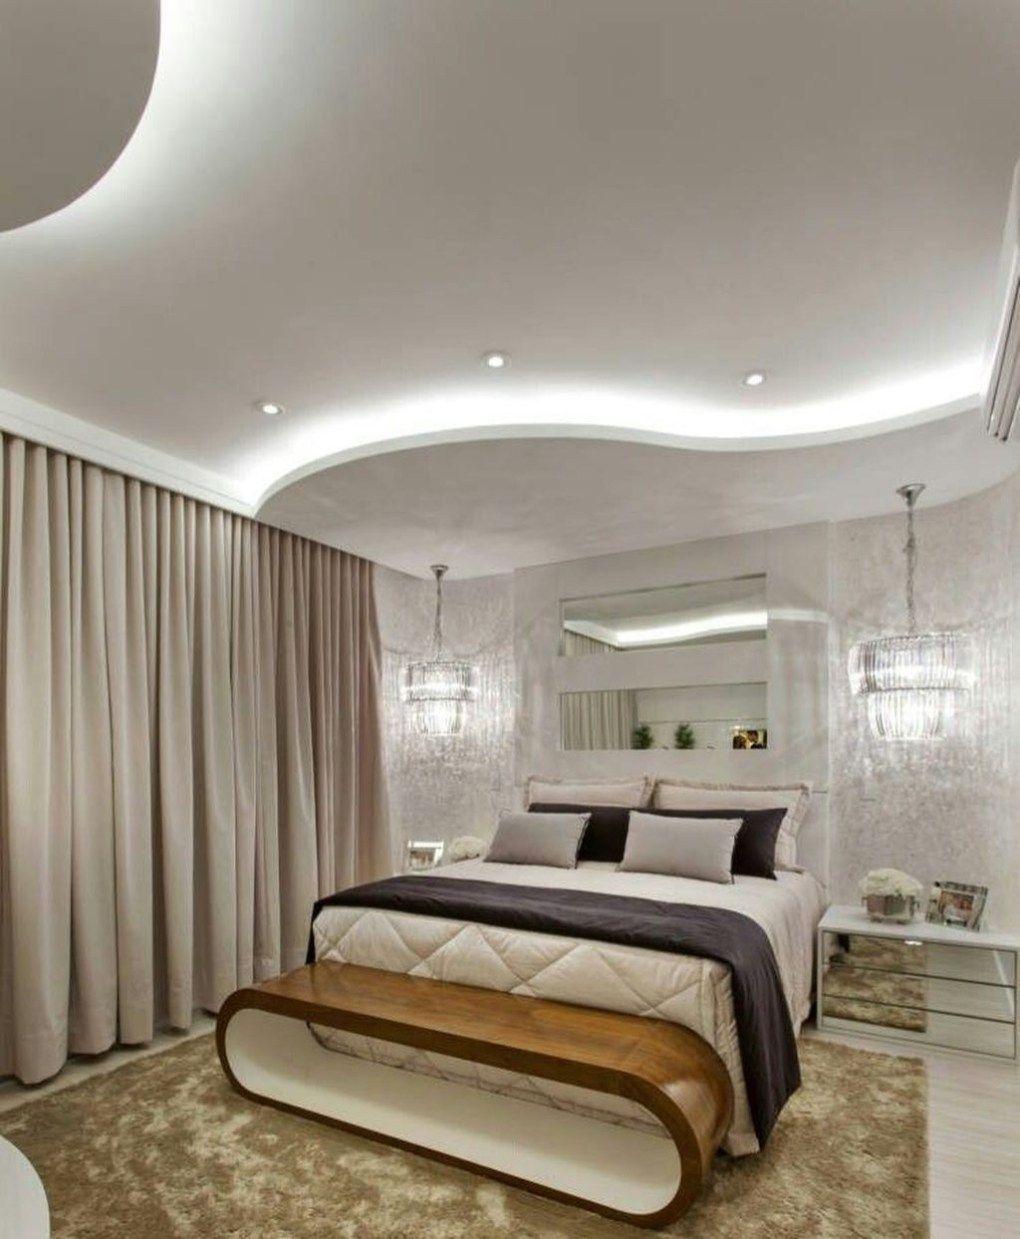 Fabulous Modern Bedroom Ceiling Designs 2018 01 In 2020 Ceiling